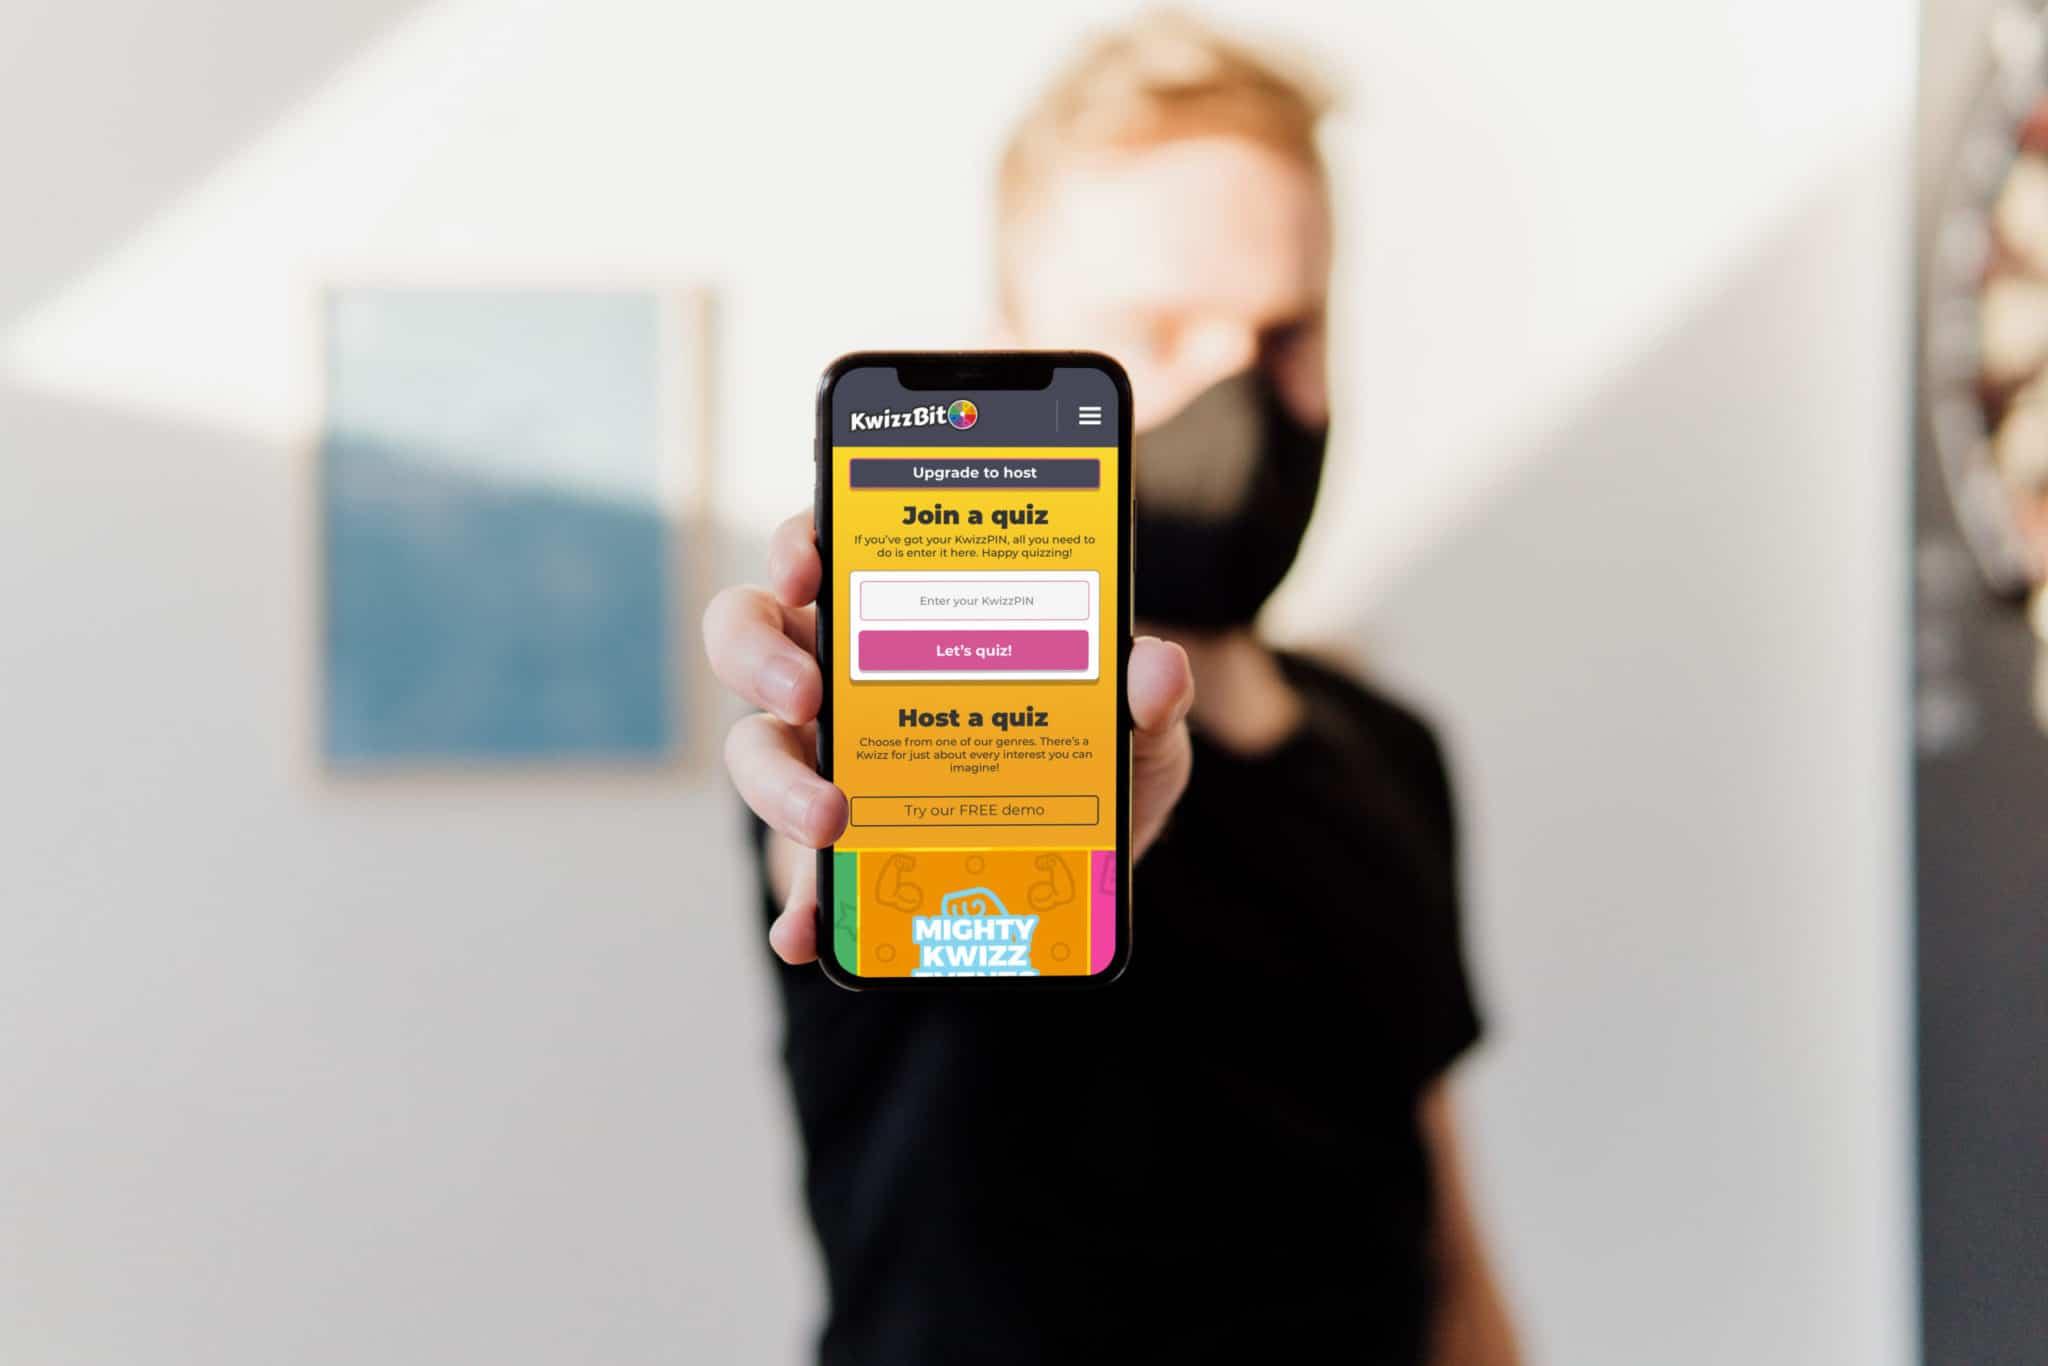 man wearing mask mobile phone displaying KwizzBit website